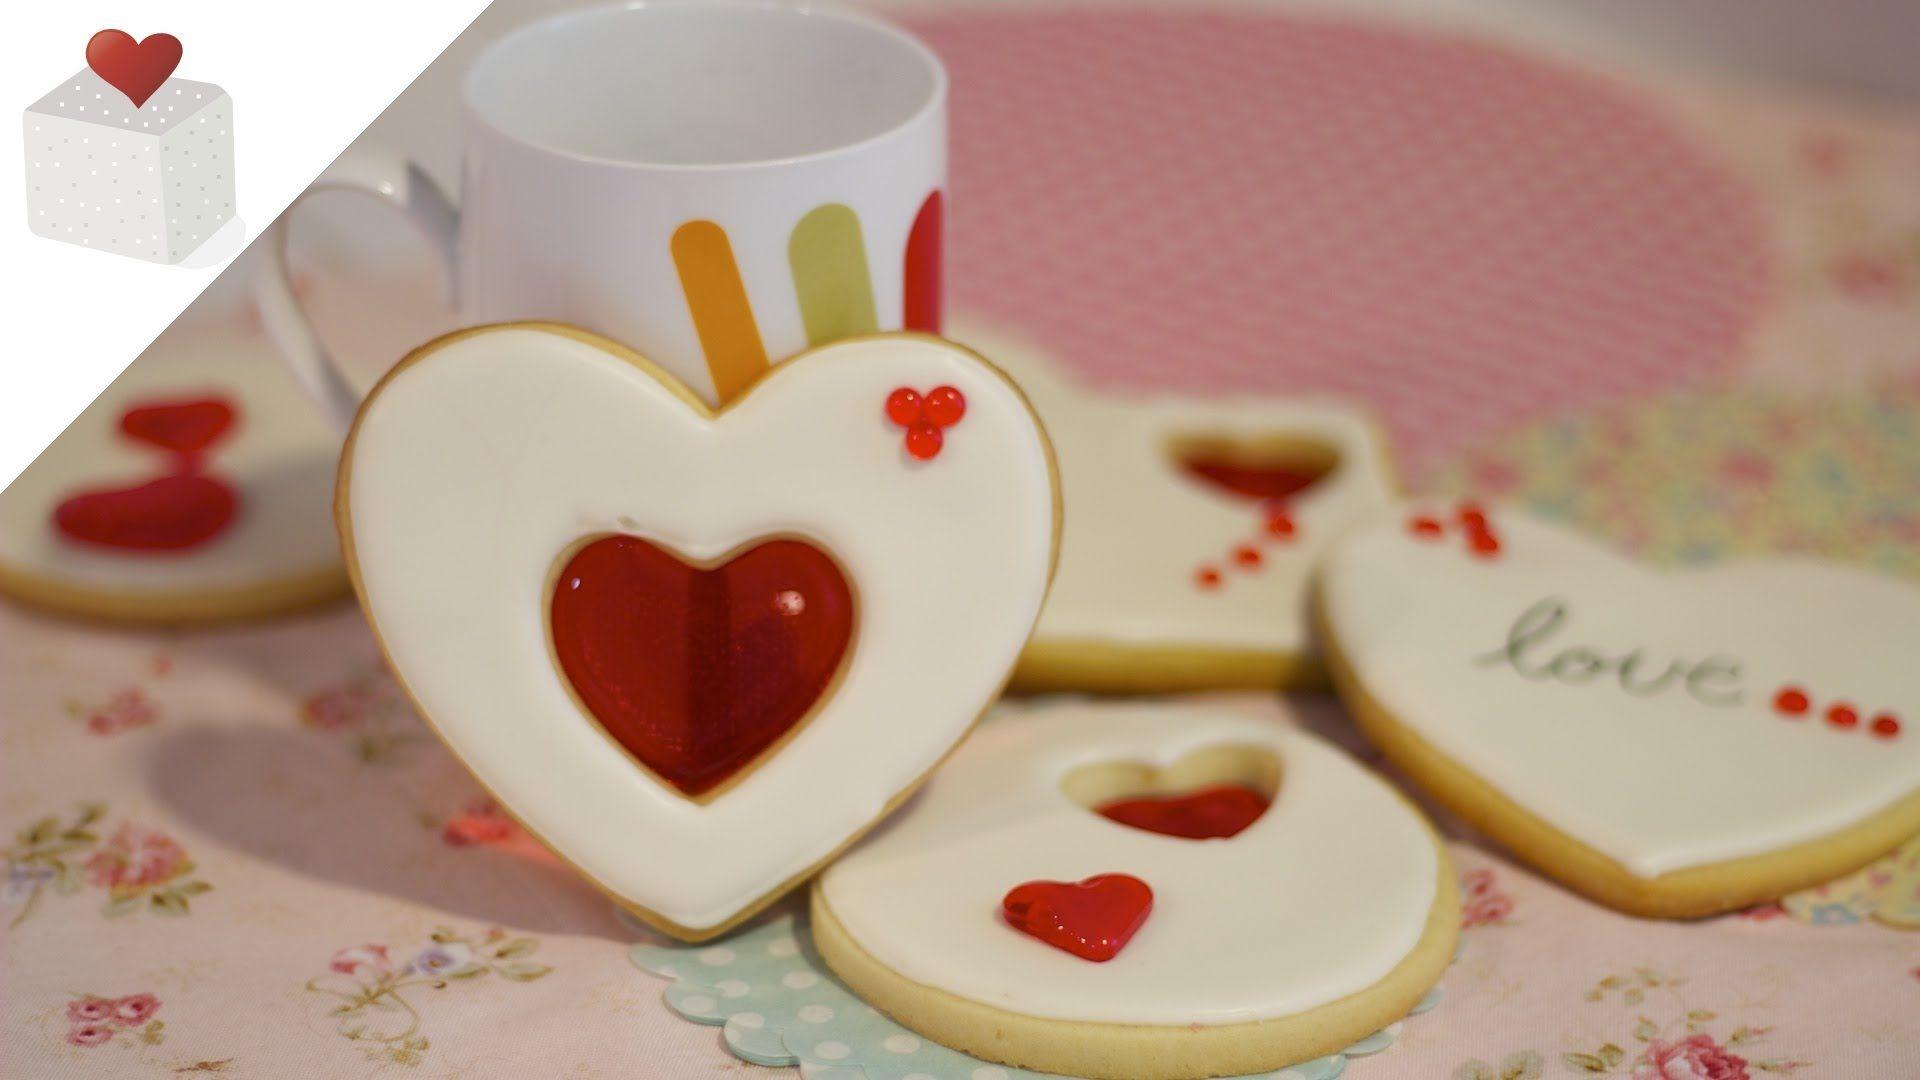 Pin by Daniela Zapata on Valentines cookies | Pinterest | Isomalt ...